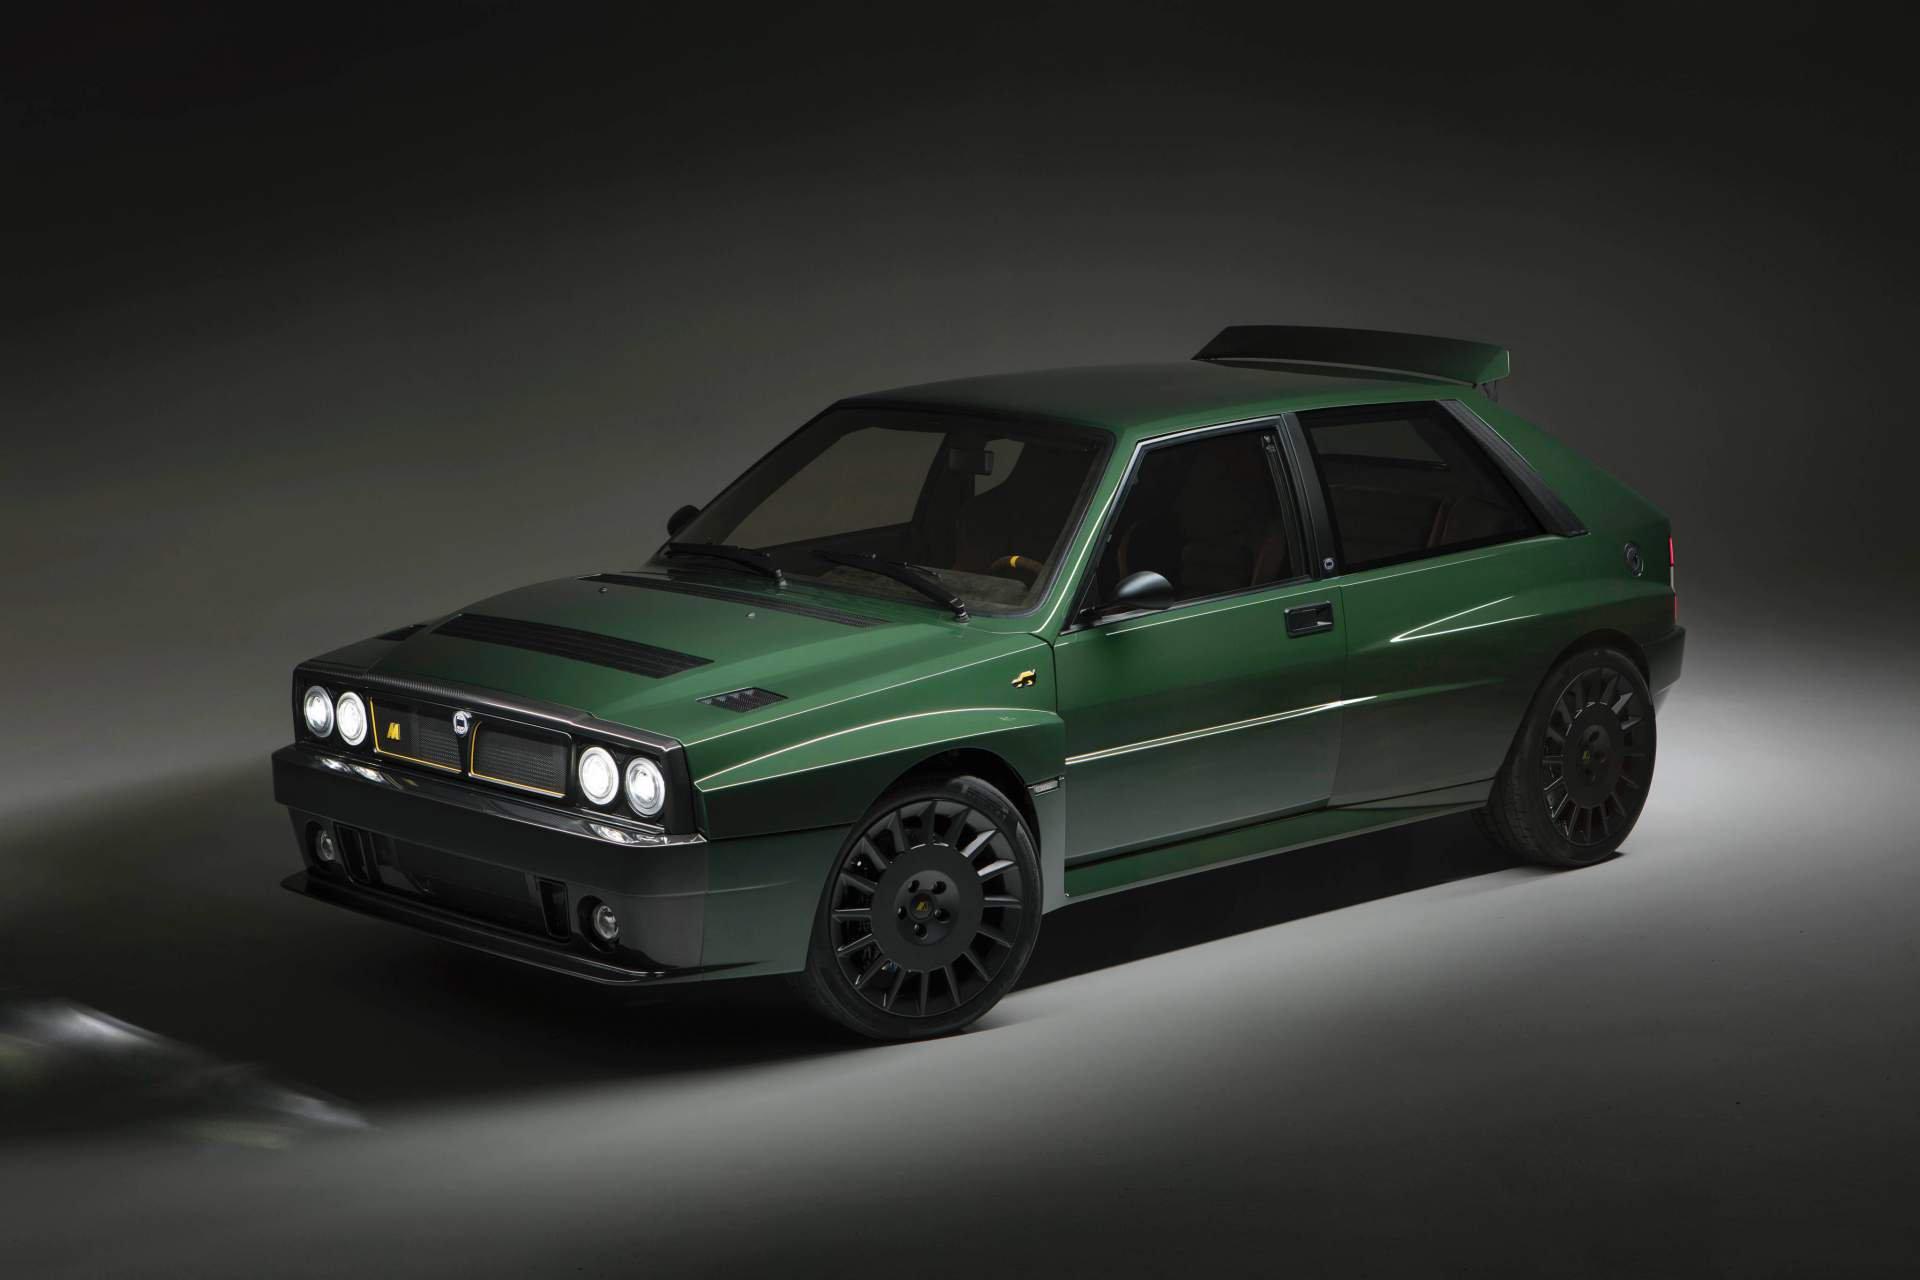 759b0ab5-automobili-amos-lancia-delta-futurista-6